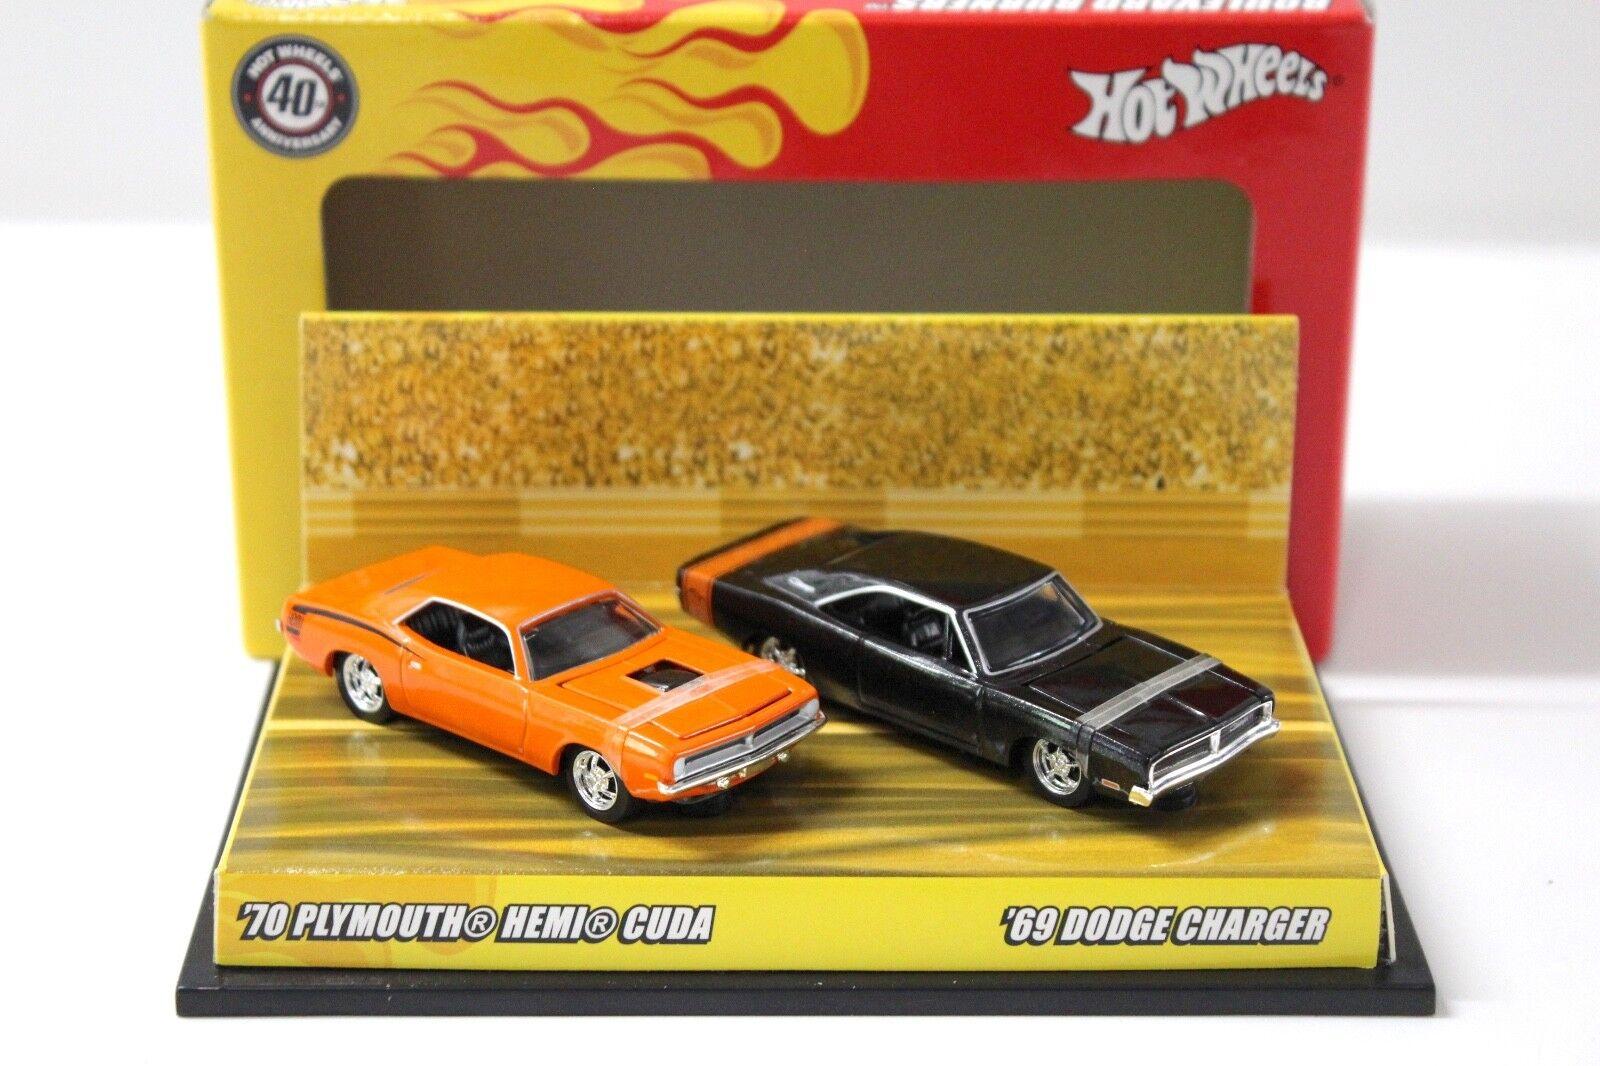 1 64 Hot Wheels 40th Boulevard Burners Set Cuda Cuda Cuda + Charger NEW bei PREMIUM-MODELC d3500e